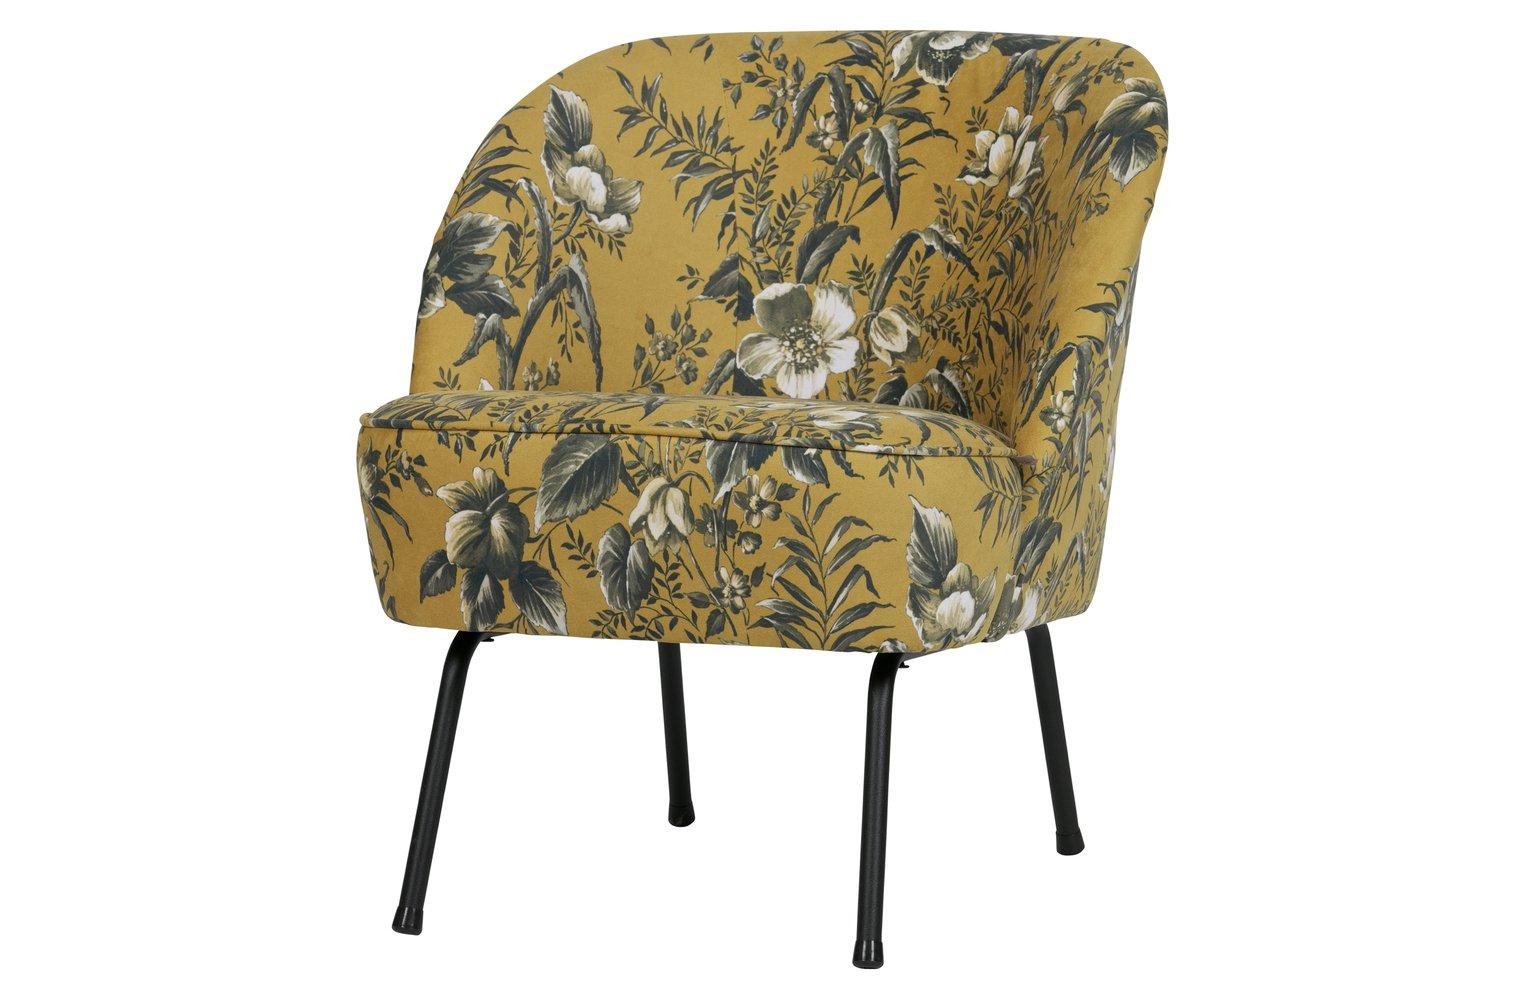 BePureHome Vogue Velvet Armchair - Mustard Floral